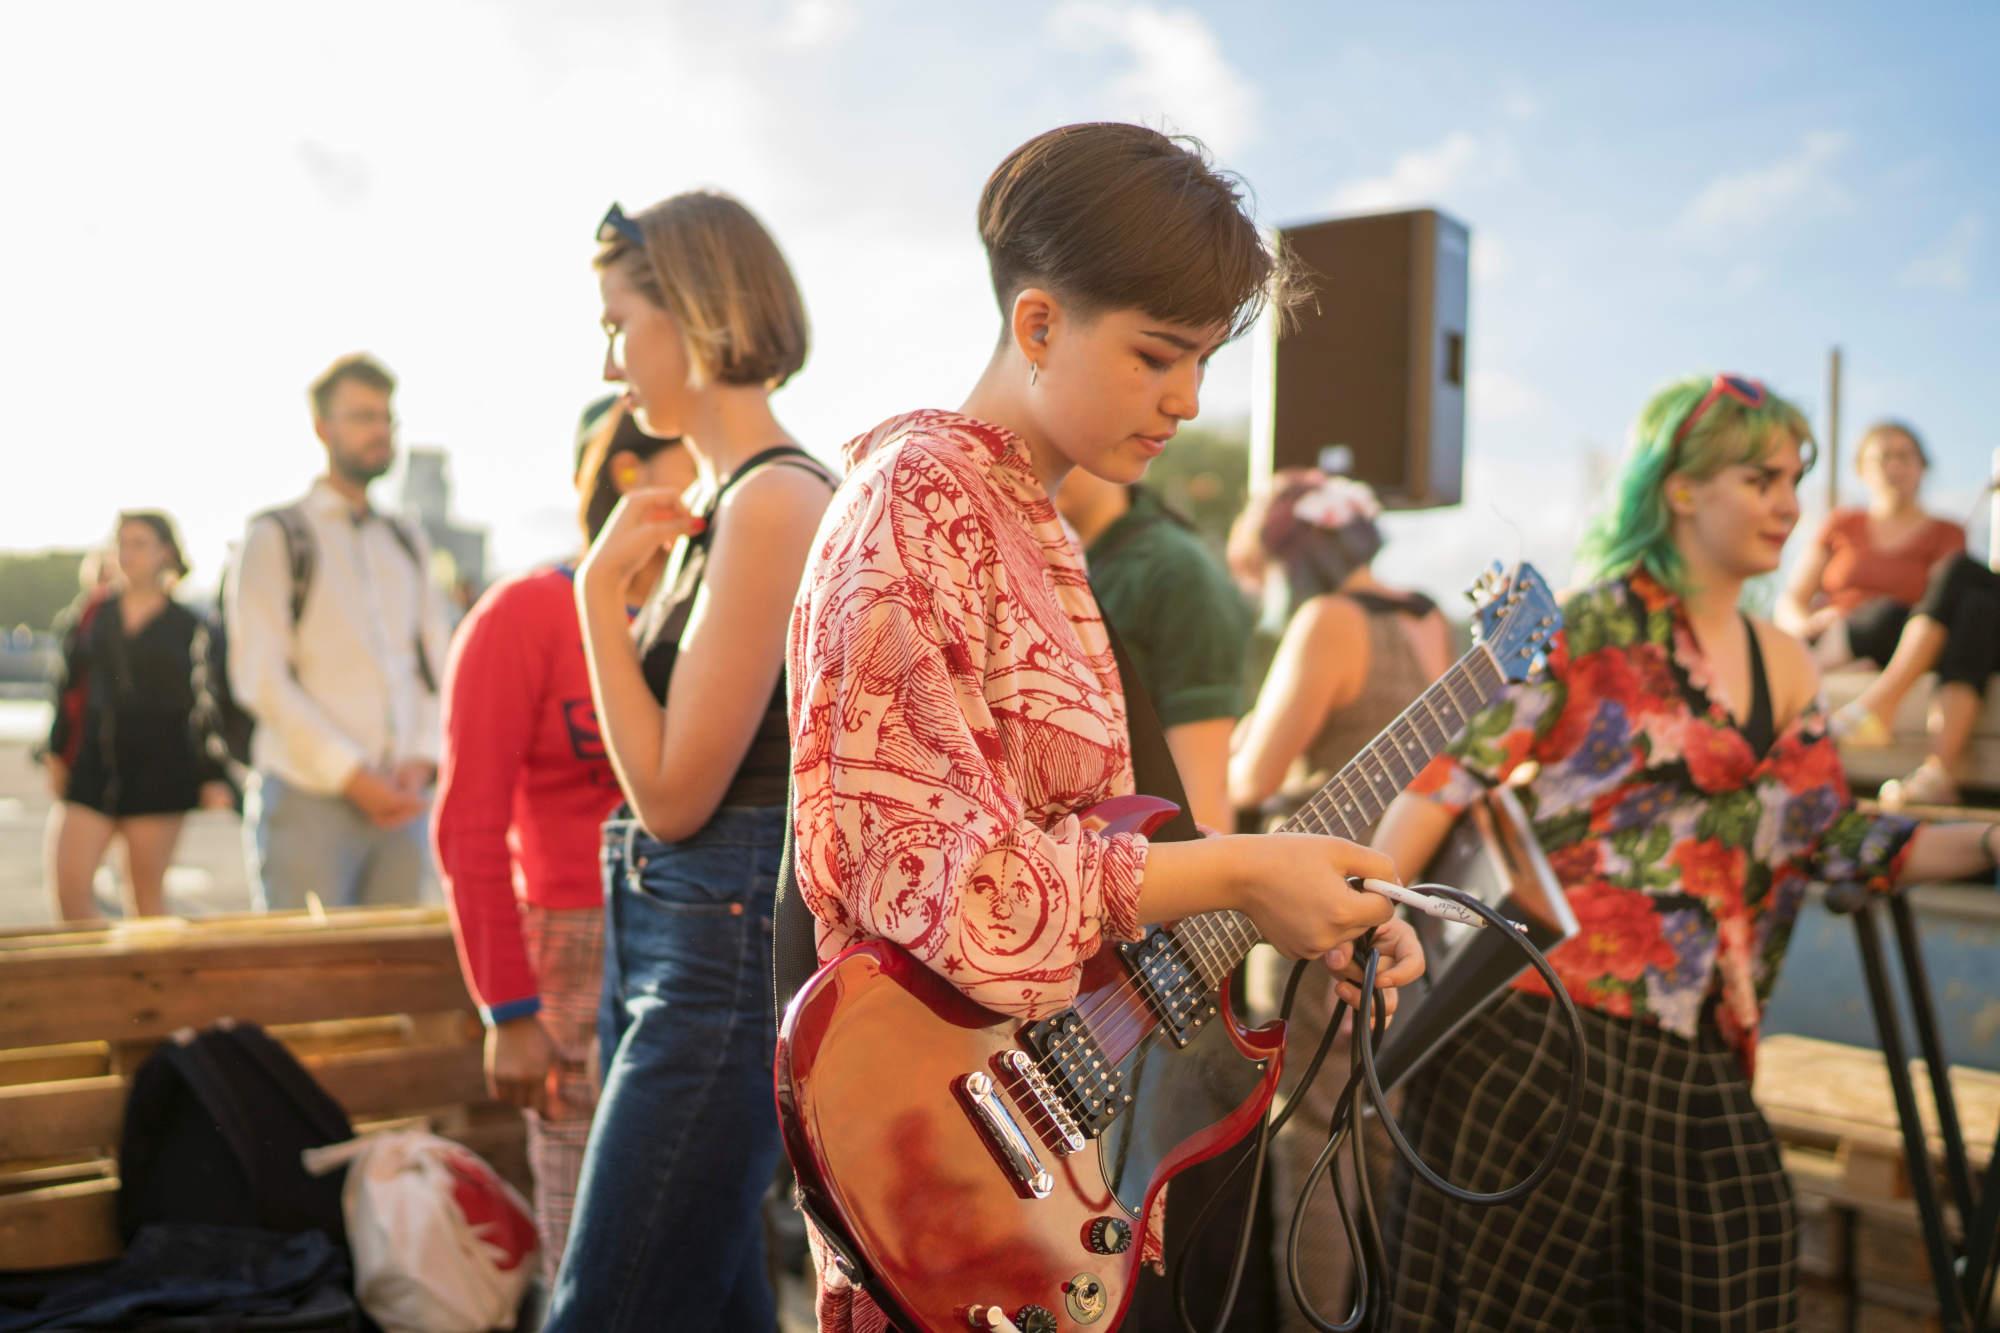 Bass player in plaid shirt